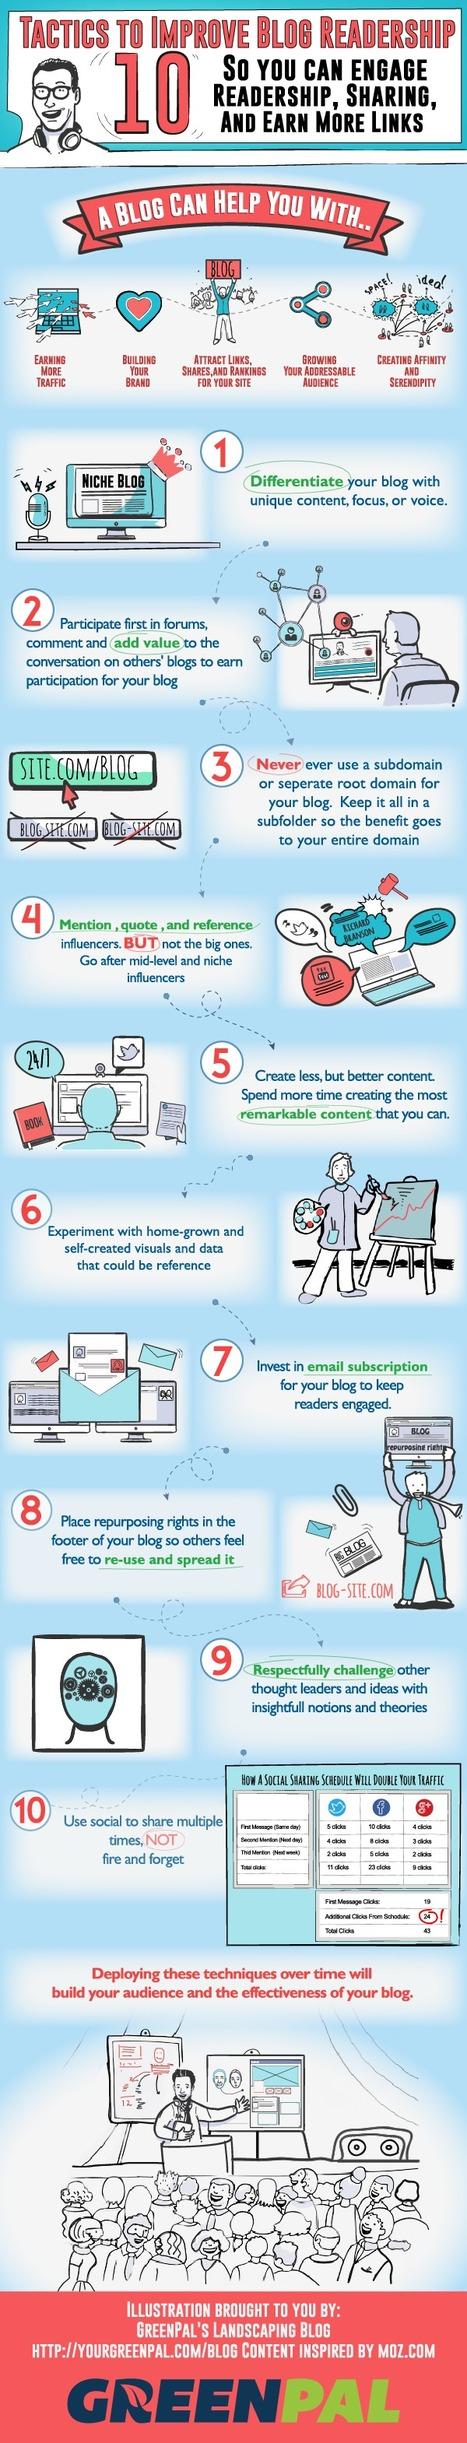 10 tactics to build your blog readership | infografias - infographics | Scoop.it